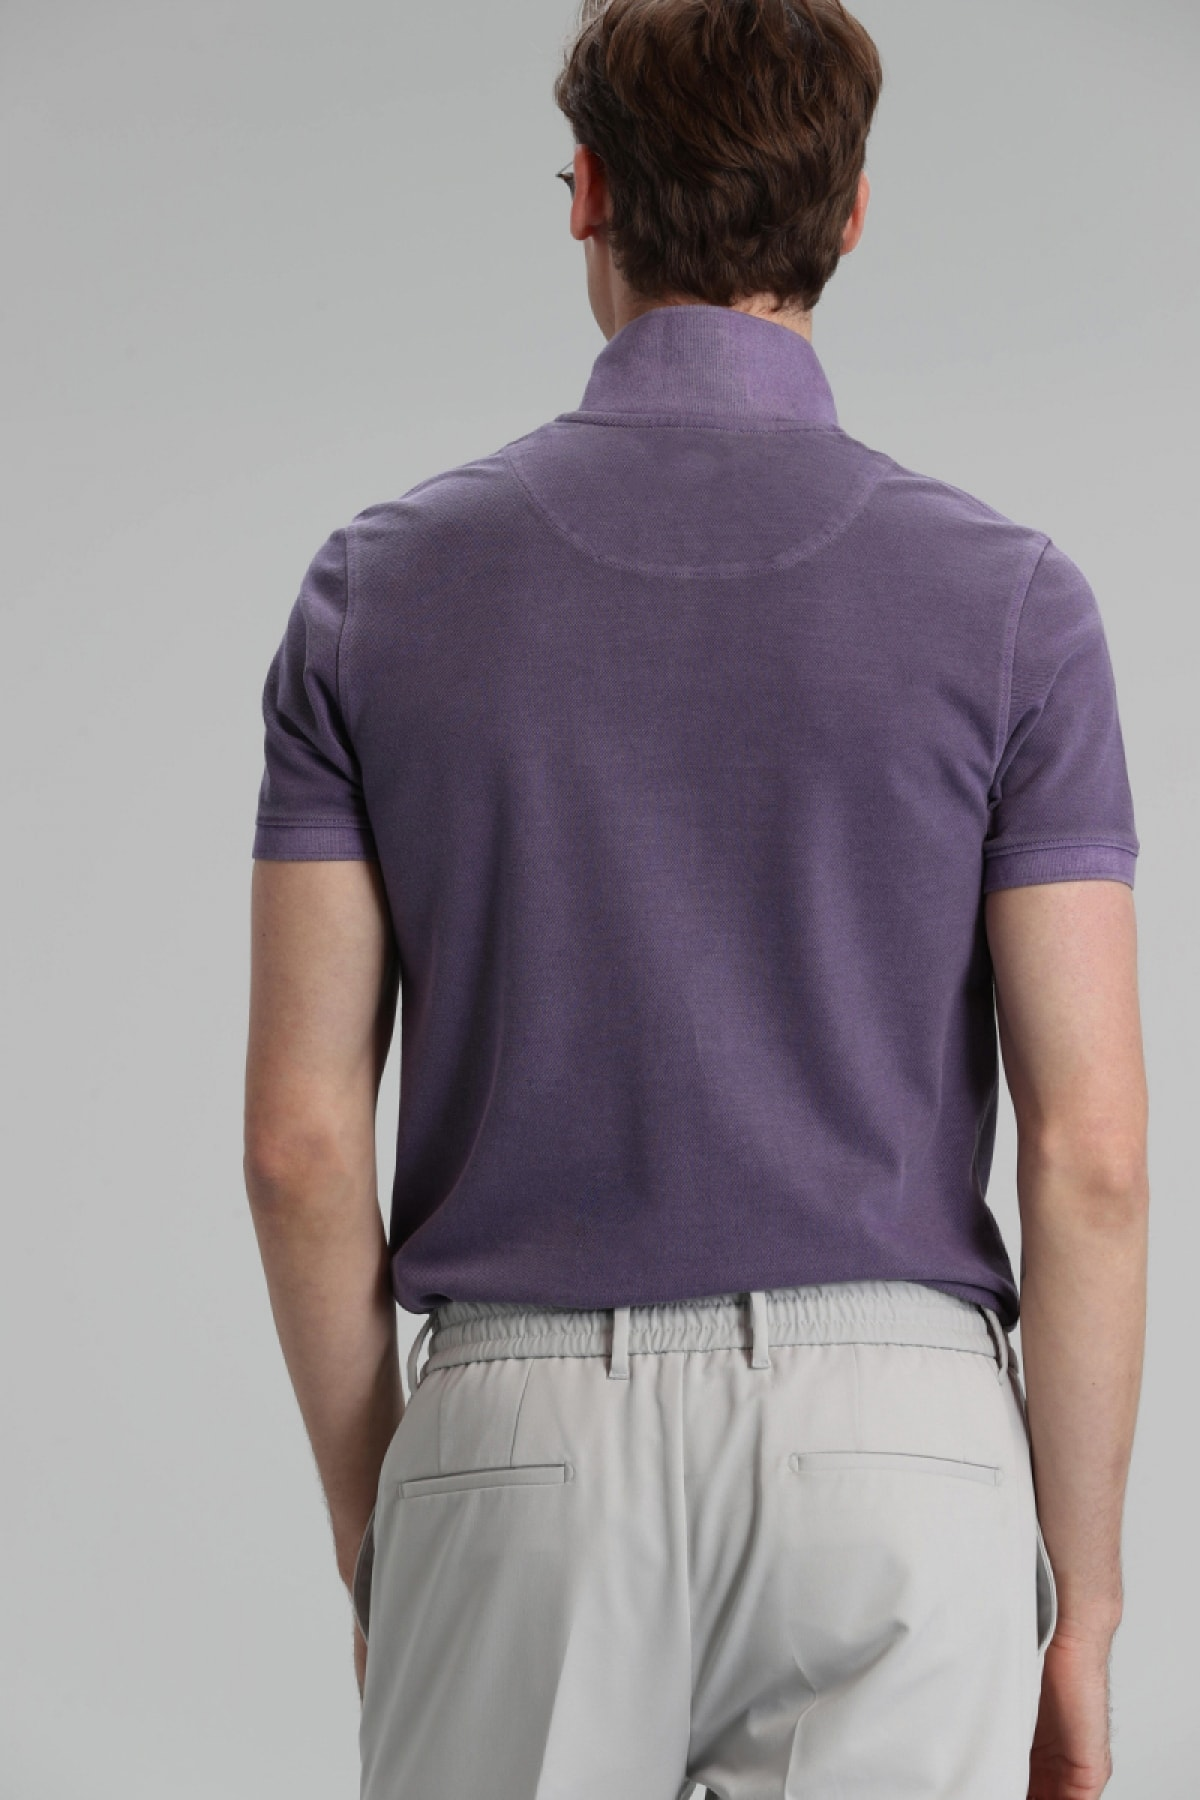 Lufian Erkek Spor Polo T- Shirt 3